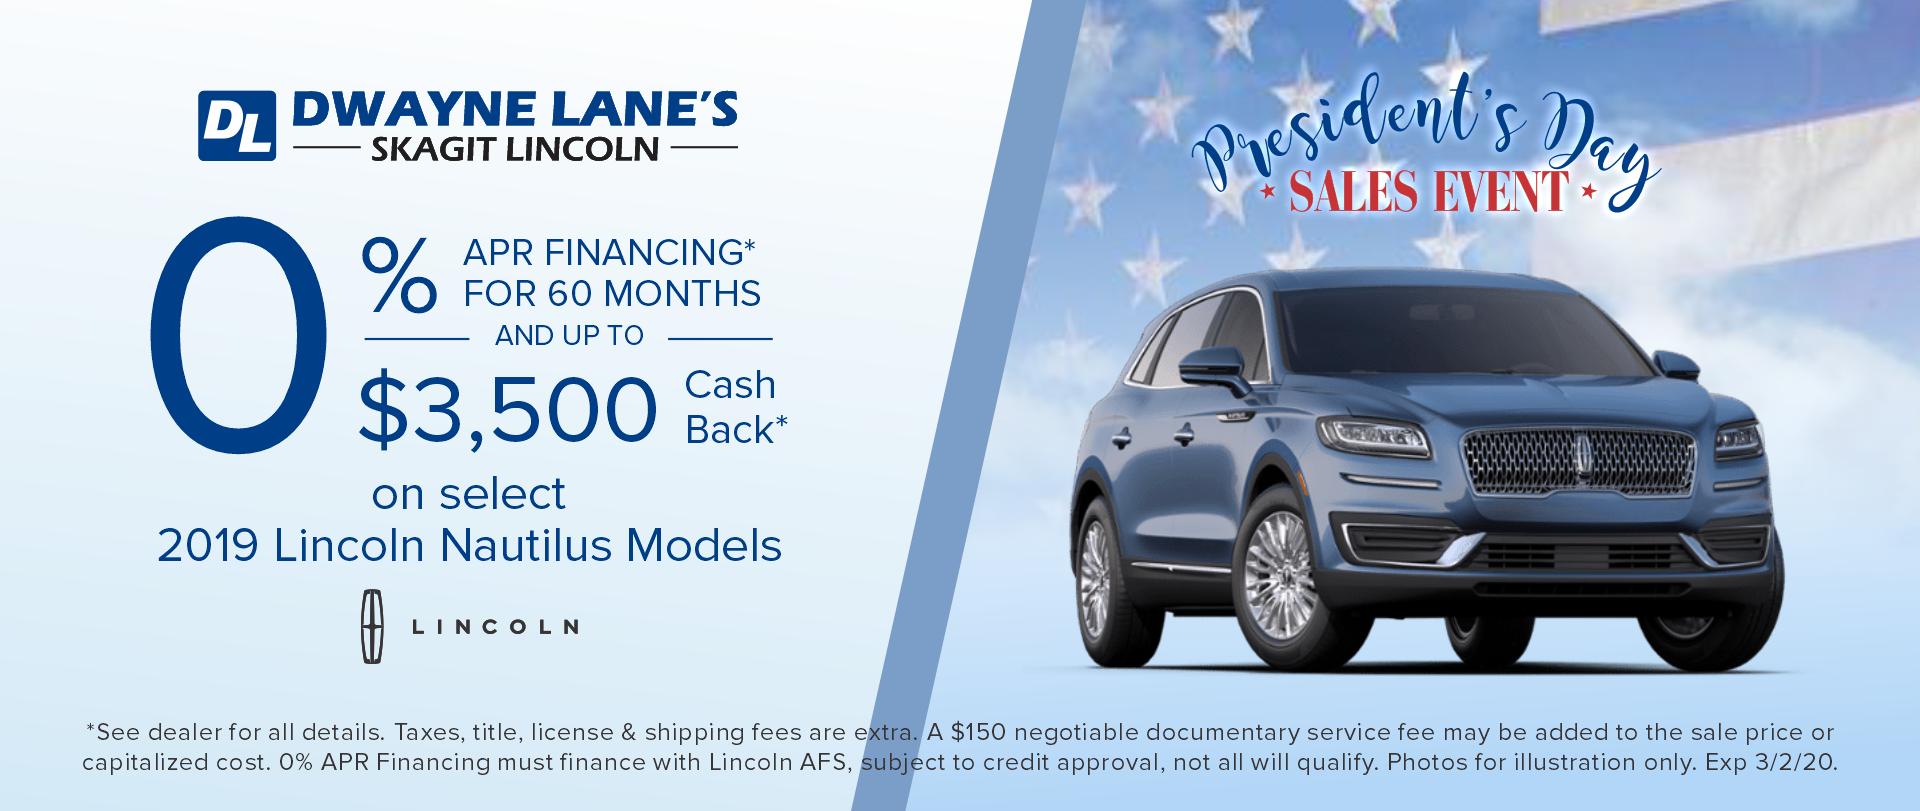 Dwayne Lane's Skagit Lincoln - 0% APR on select Lincoln Nautilus models